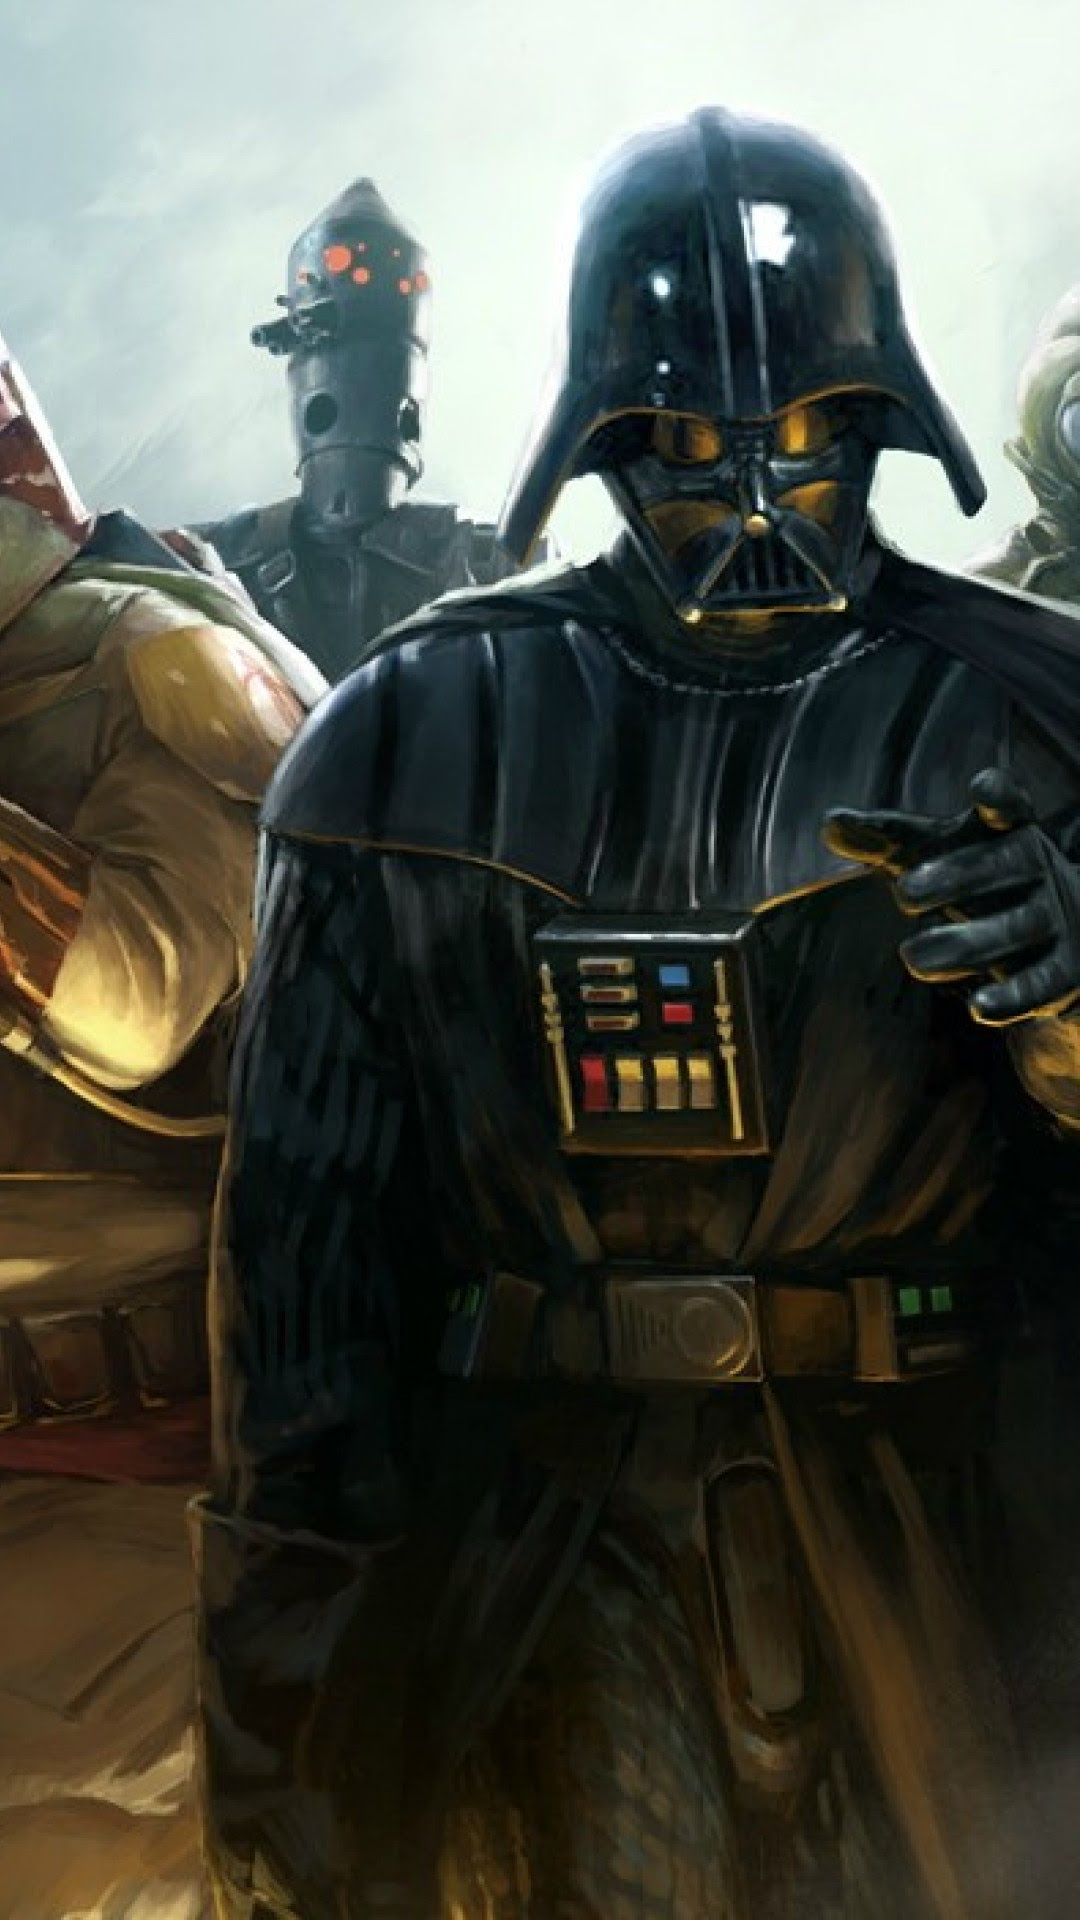 Darth Vader Hd Wallpaper Iphone 6 6s Plus Hd Wallpaper